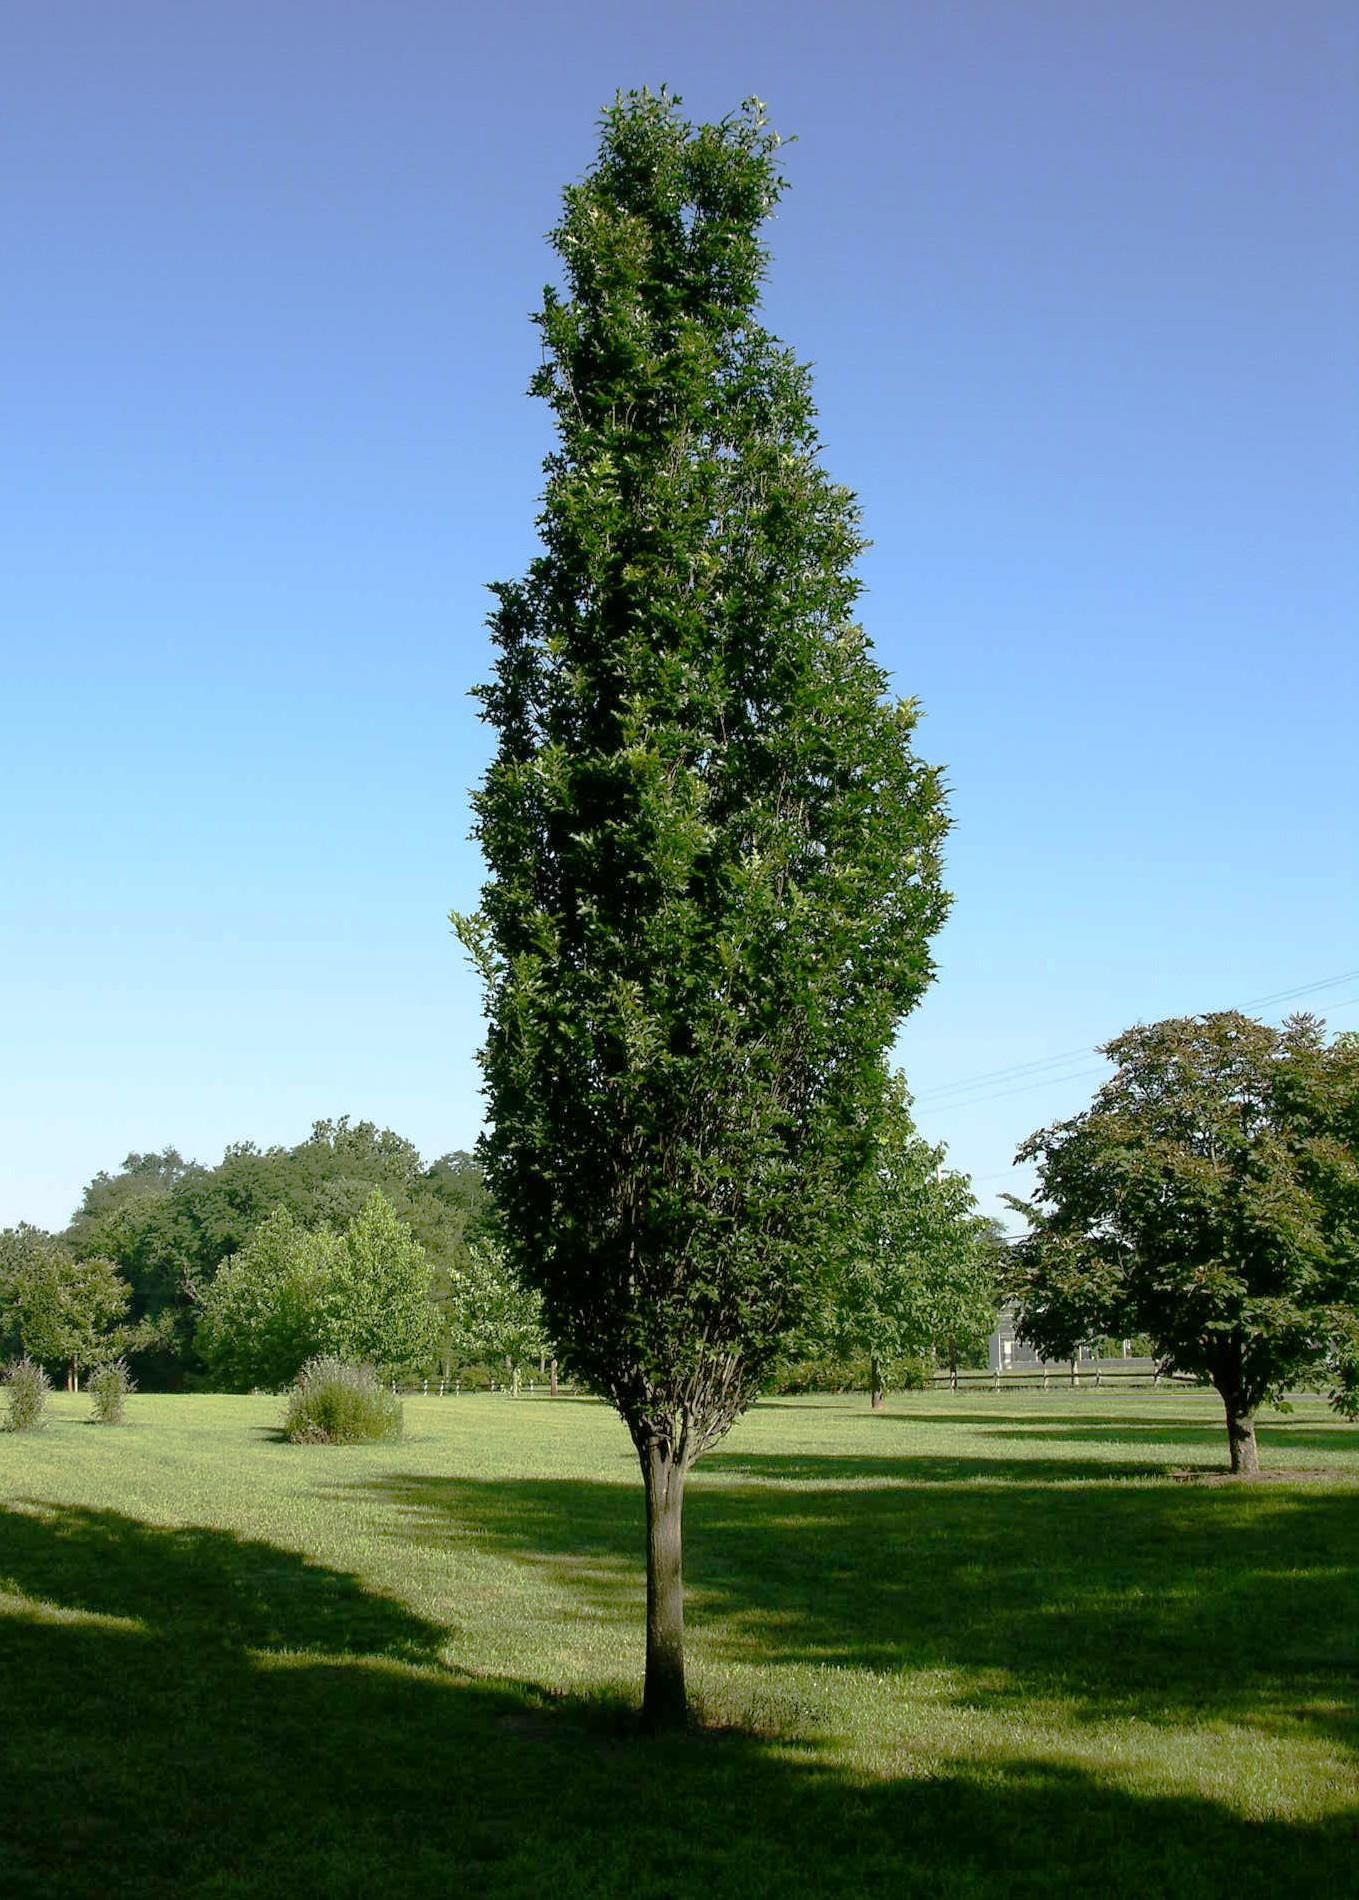 Regal Prince Oak - Oak Trees - Fall Color